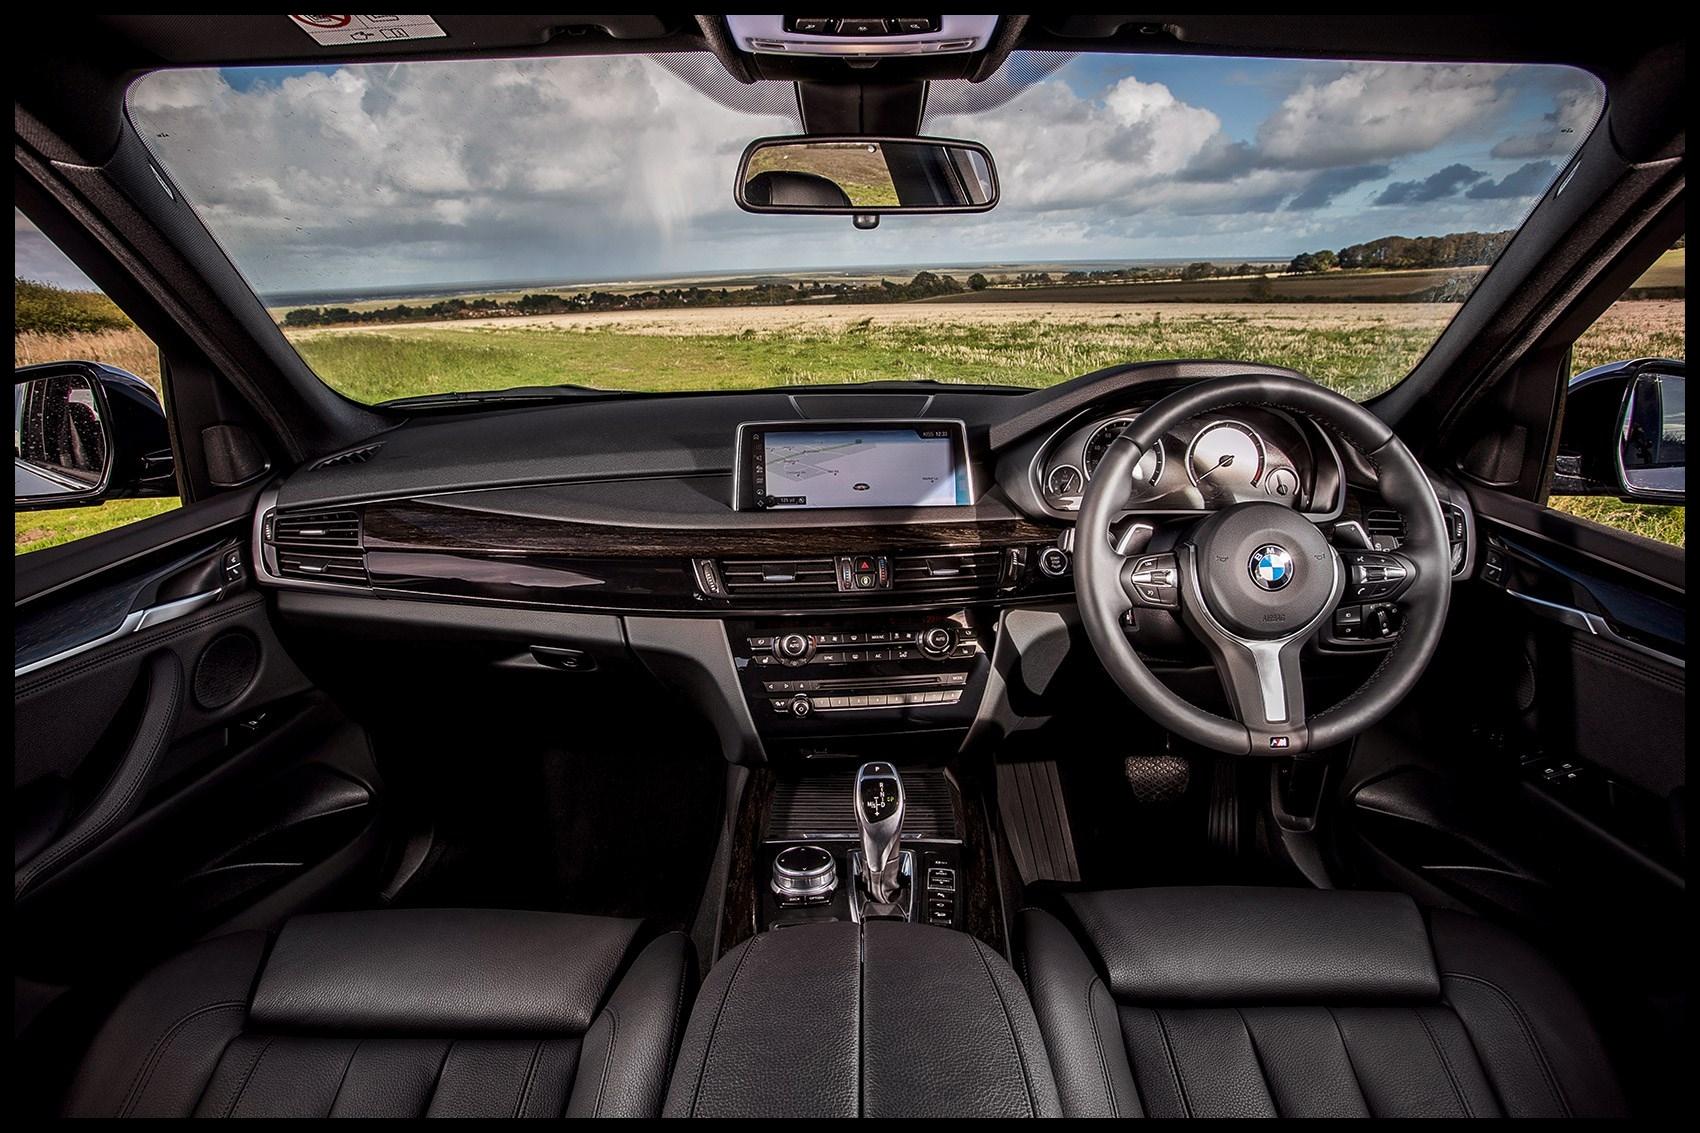 BMW X5 cockpit due for retirement soon